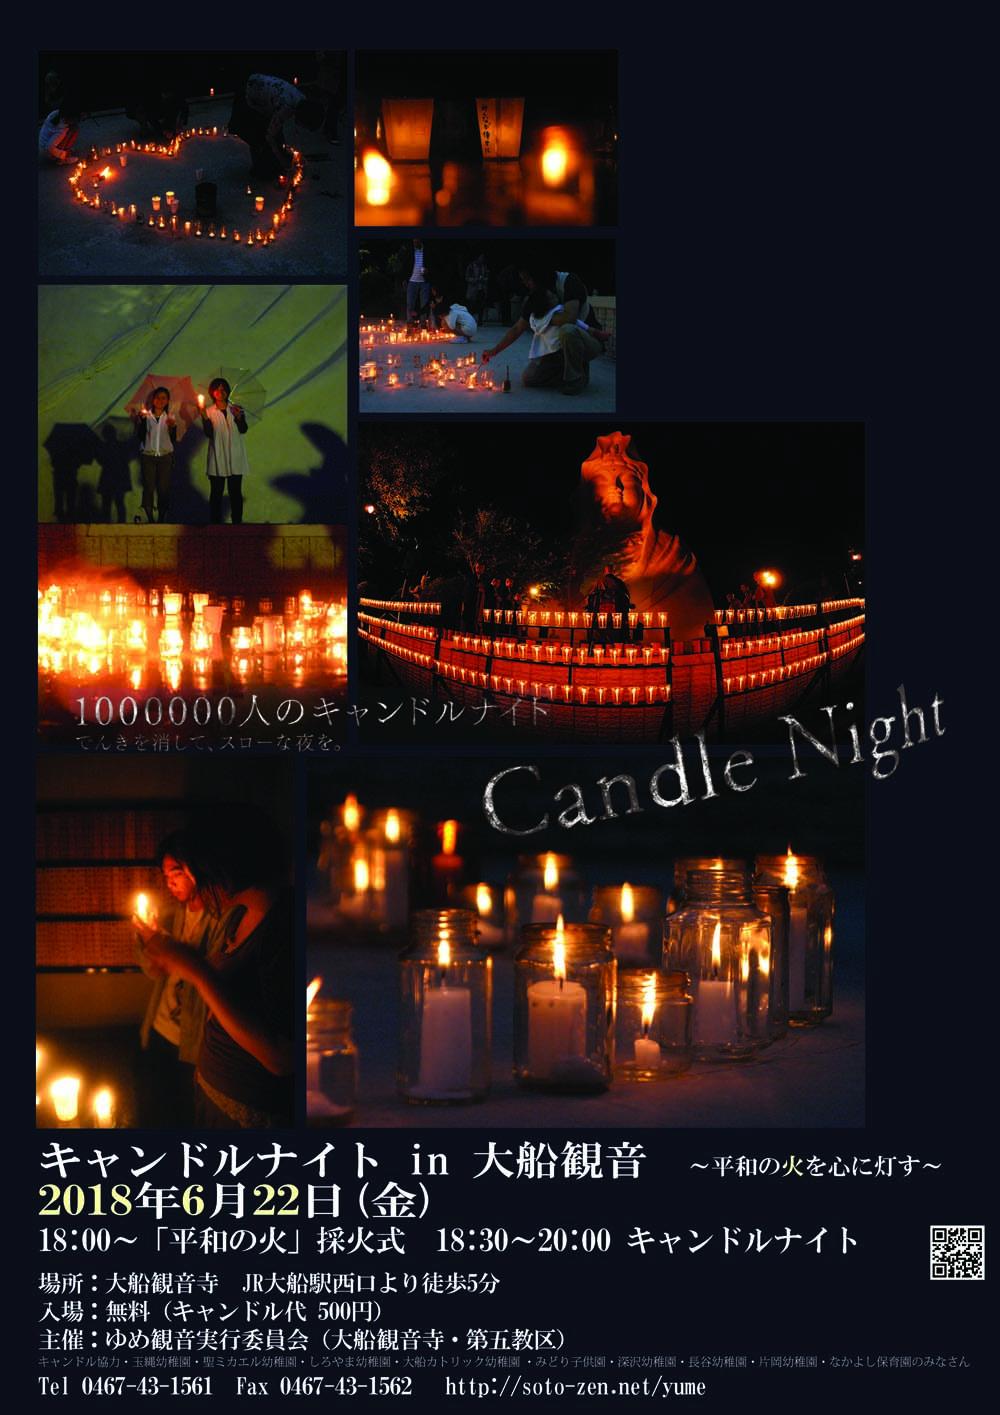 http://soto-zen.net/yume/candle2018.jpg